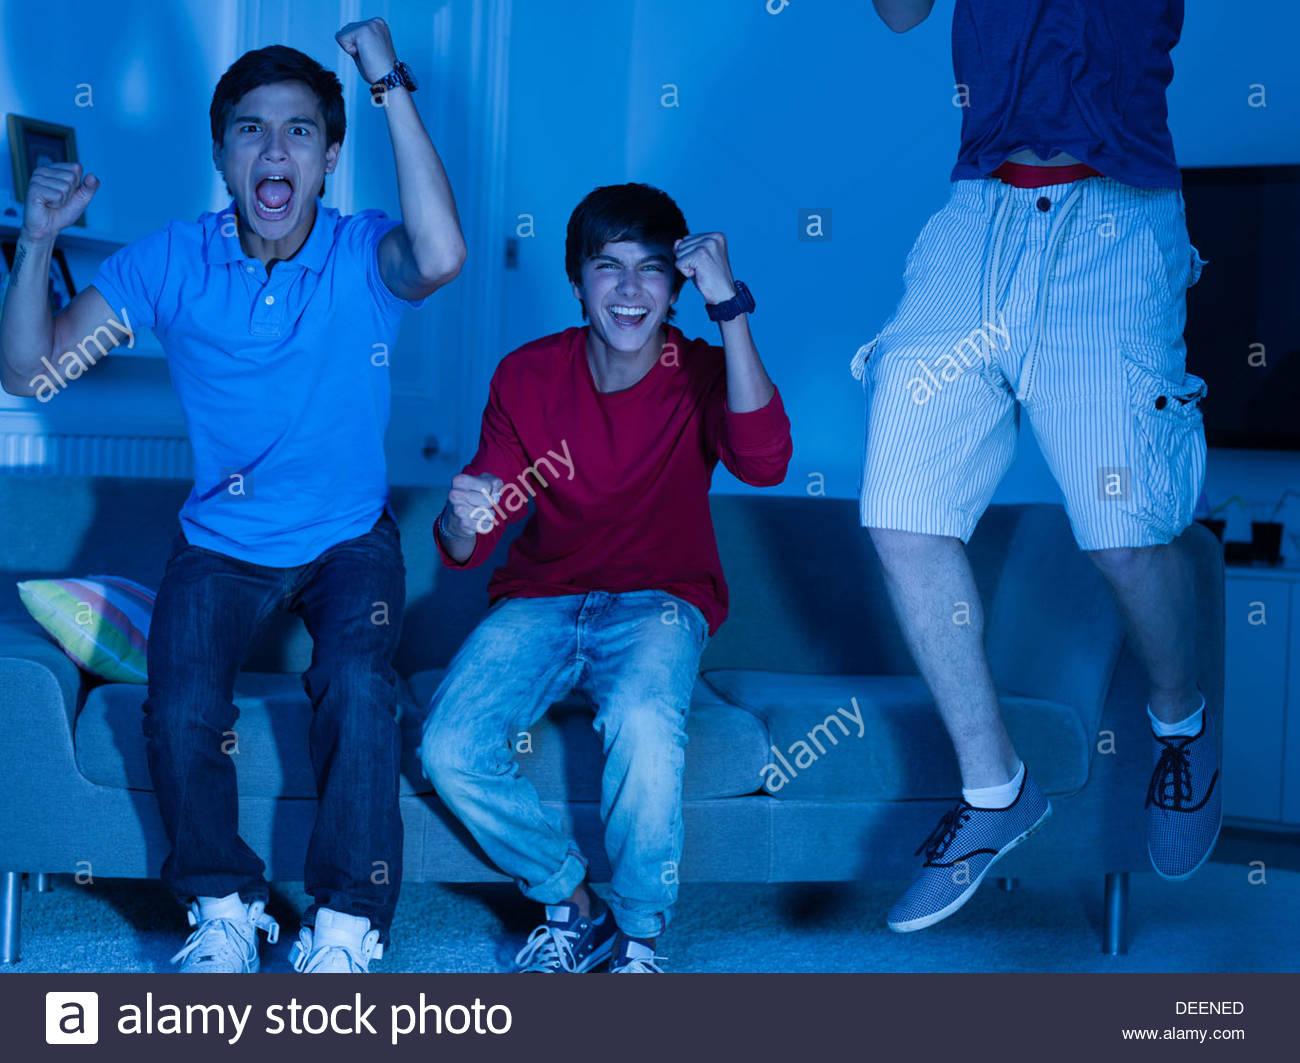 Shouting teenage boys watching television - Stock Image